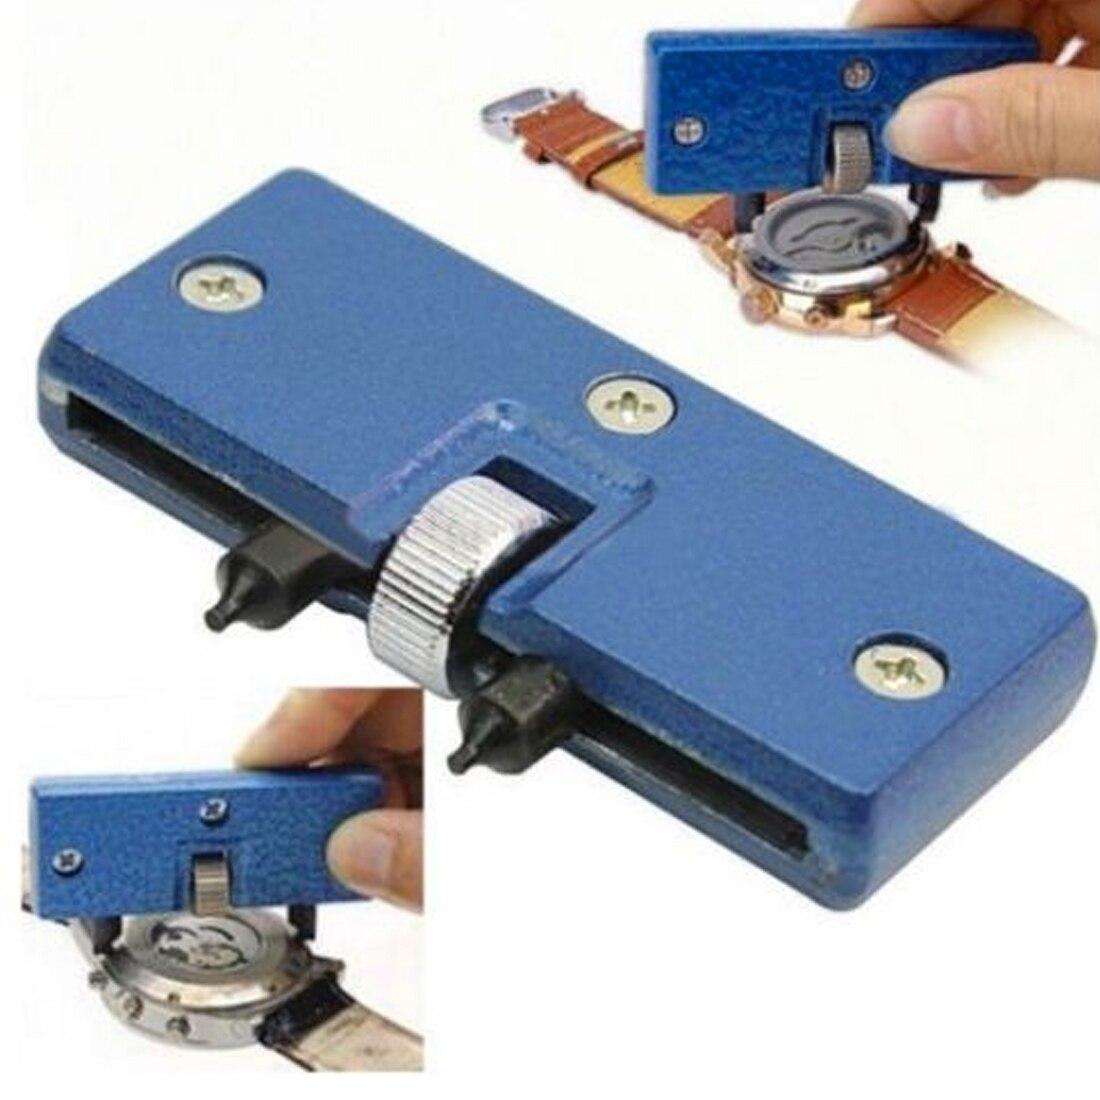 Watches Repair Tools Watchmaker Remover Movement Repair  Screw-on Back Case Watch Tools  Adjustable Opener Tool